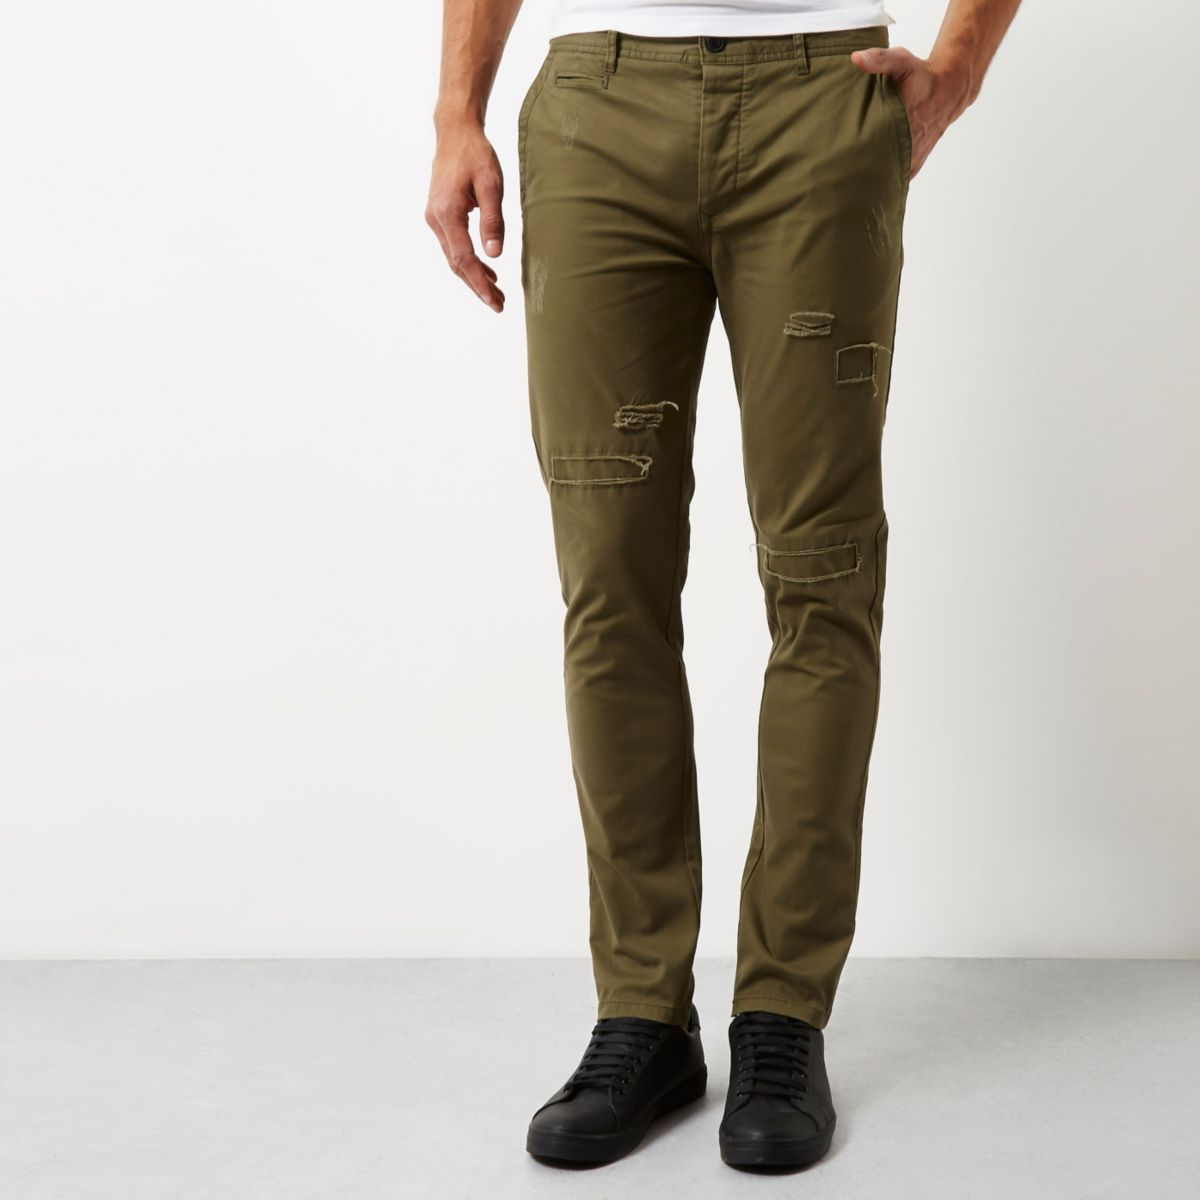 Green ripped skinny chino pants